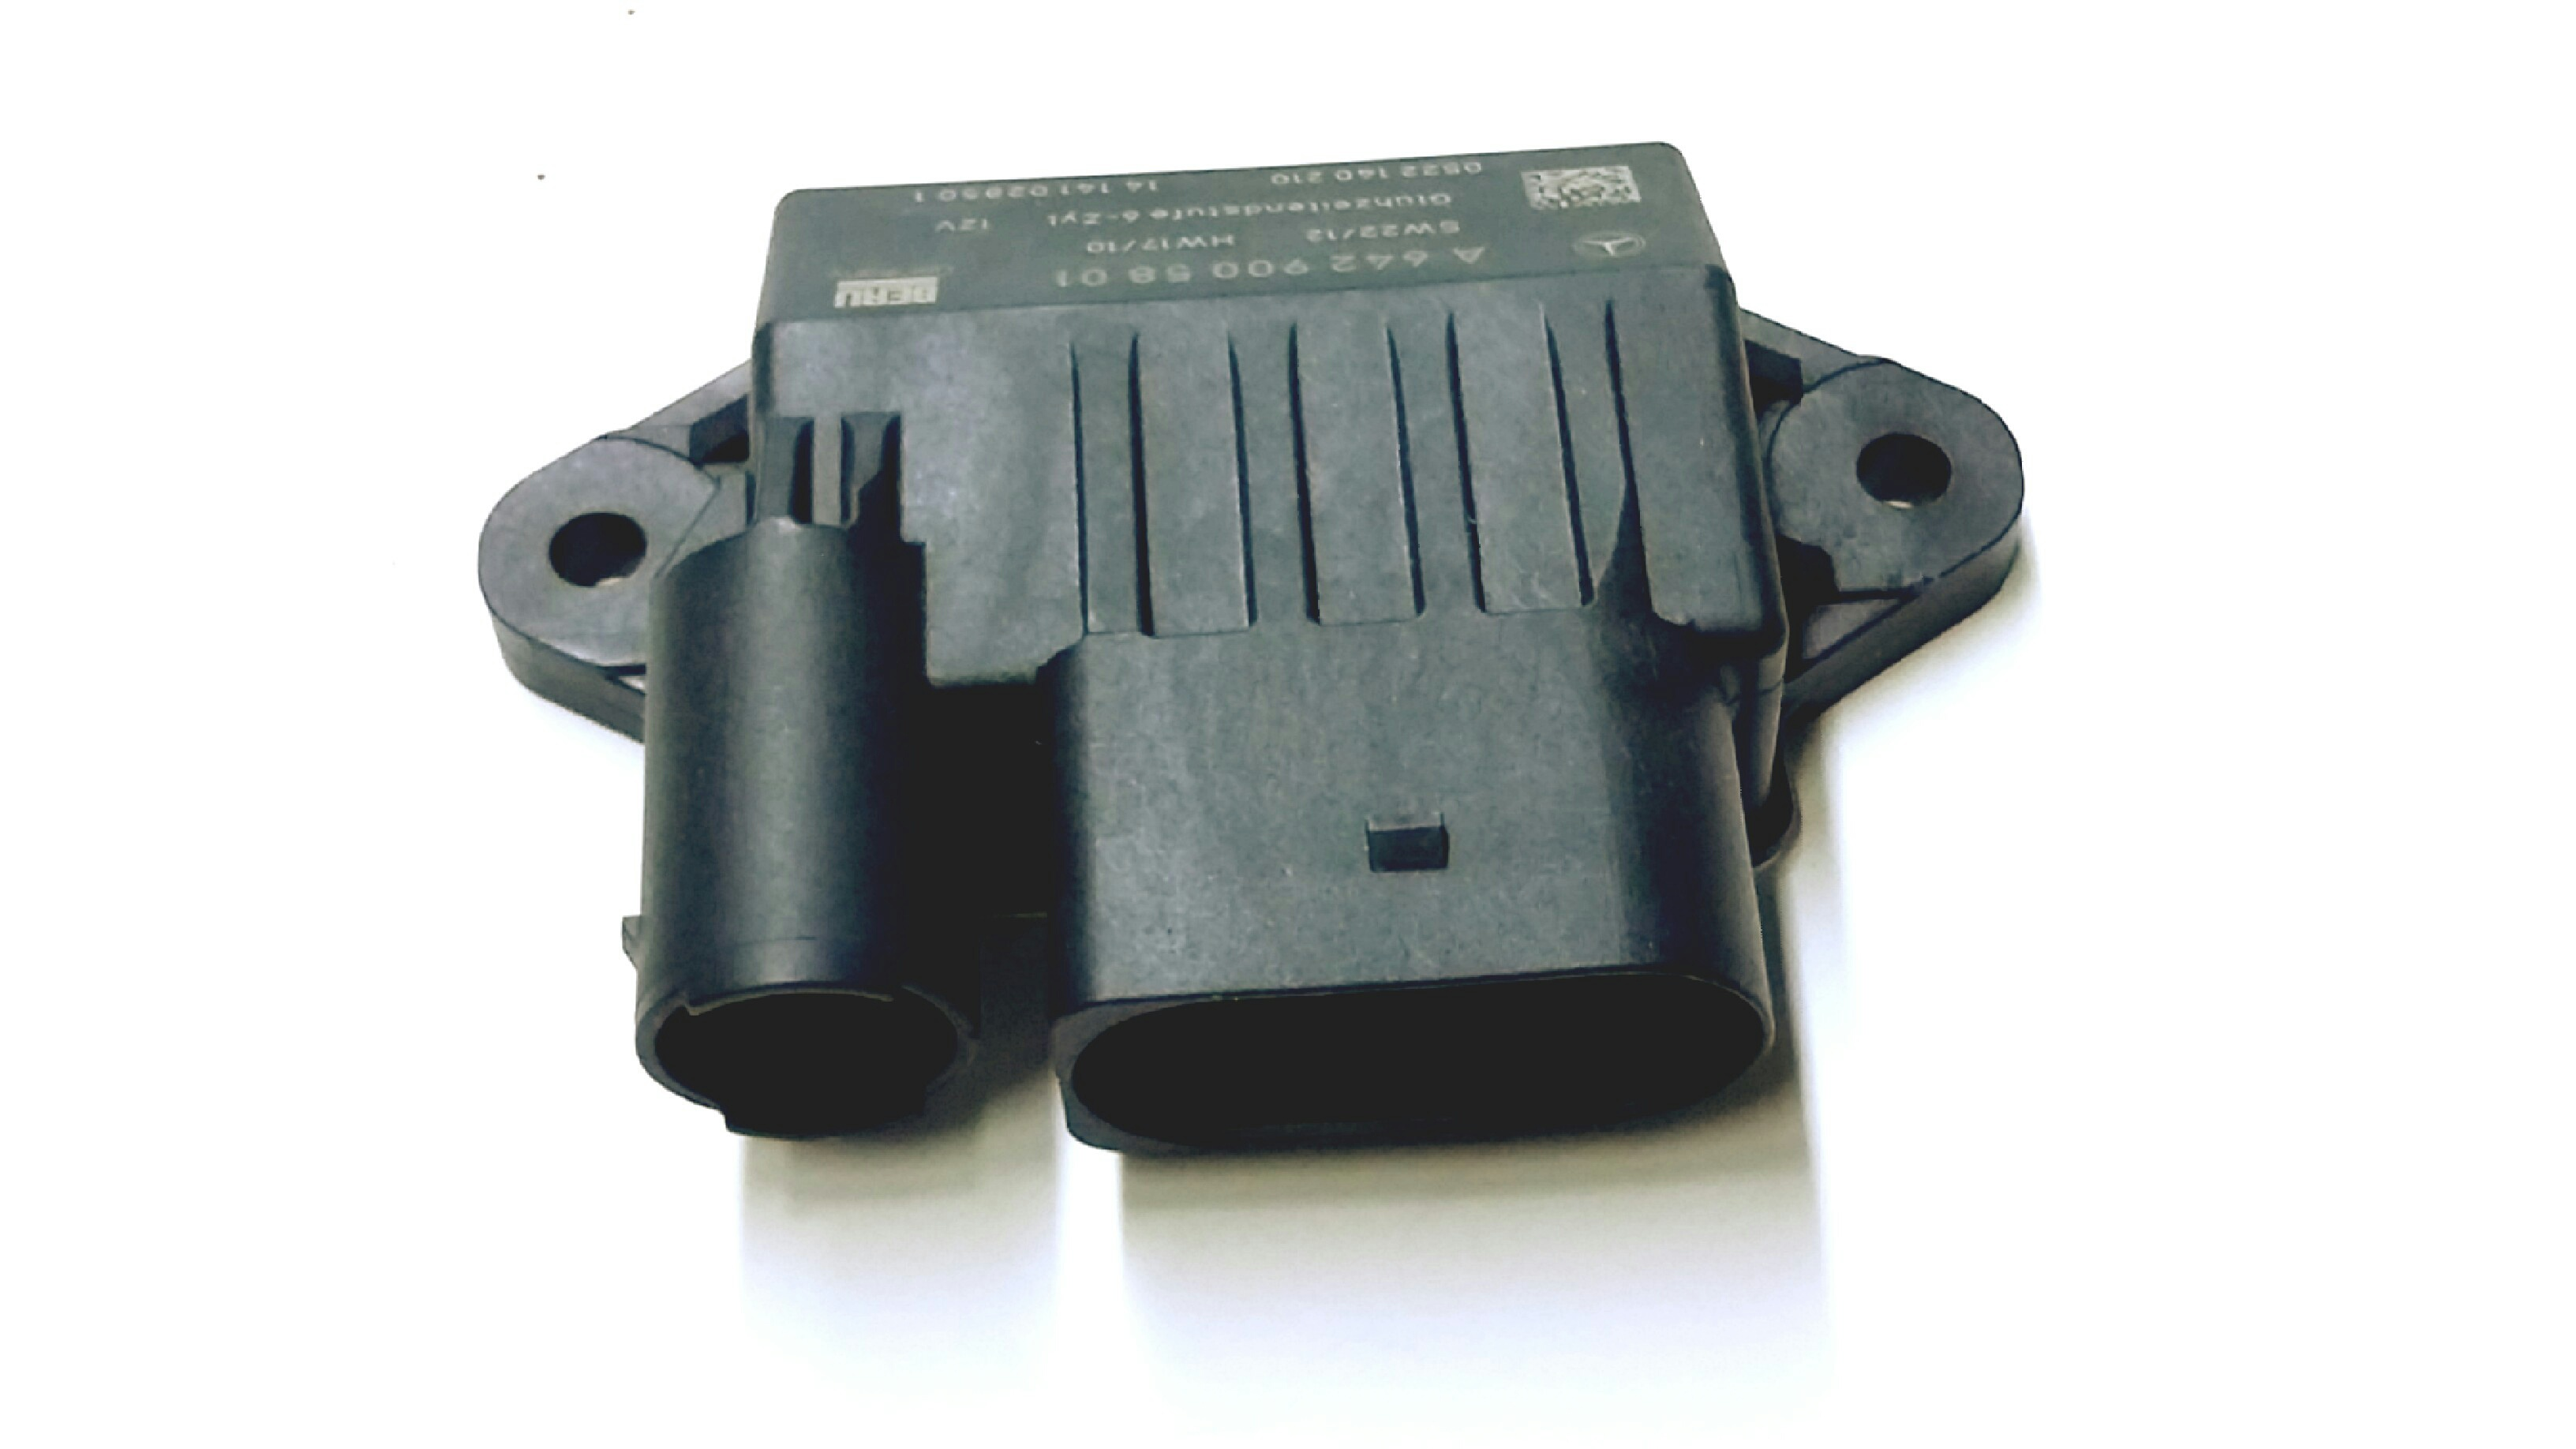 Mercedes Sprinter Glow Plug Wiring Diagram : Glow plug relay wiring diagram dodge sprinter